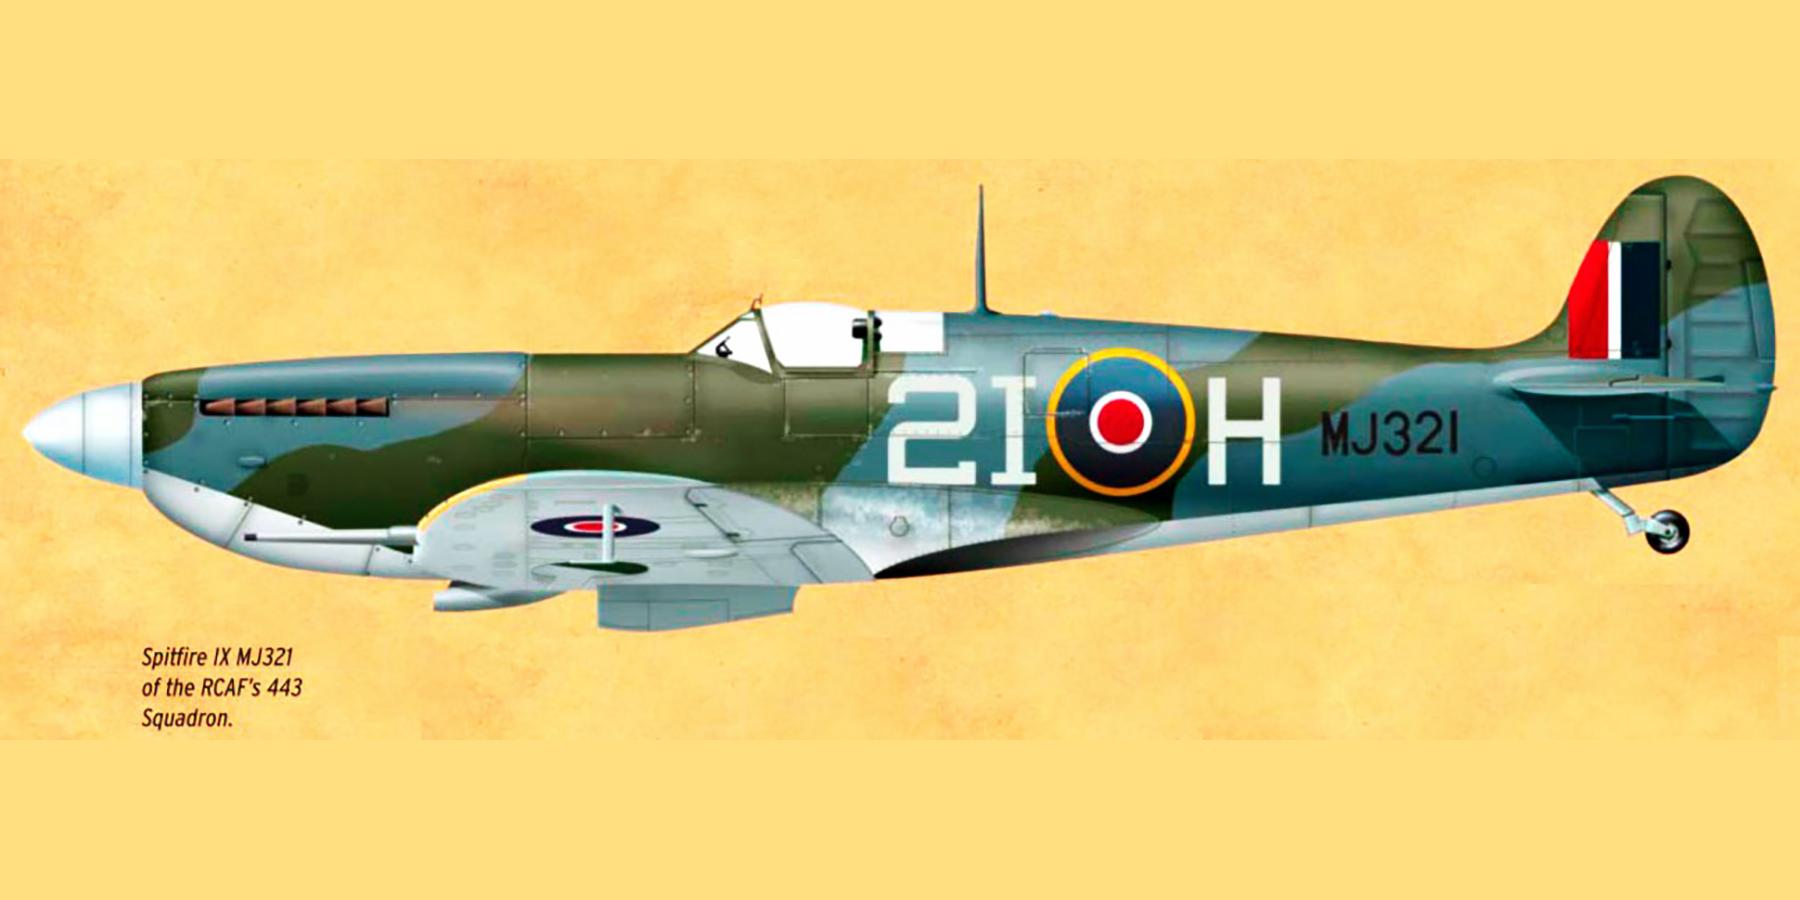 Spitfire MkIX RCAF 443Sqn 2IH MJ321 England 1944 0A